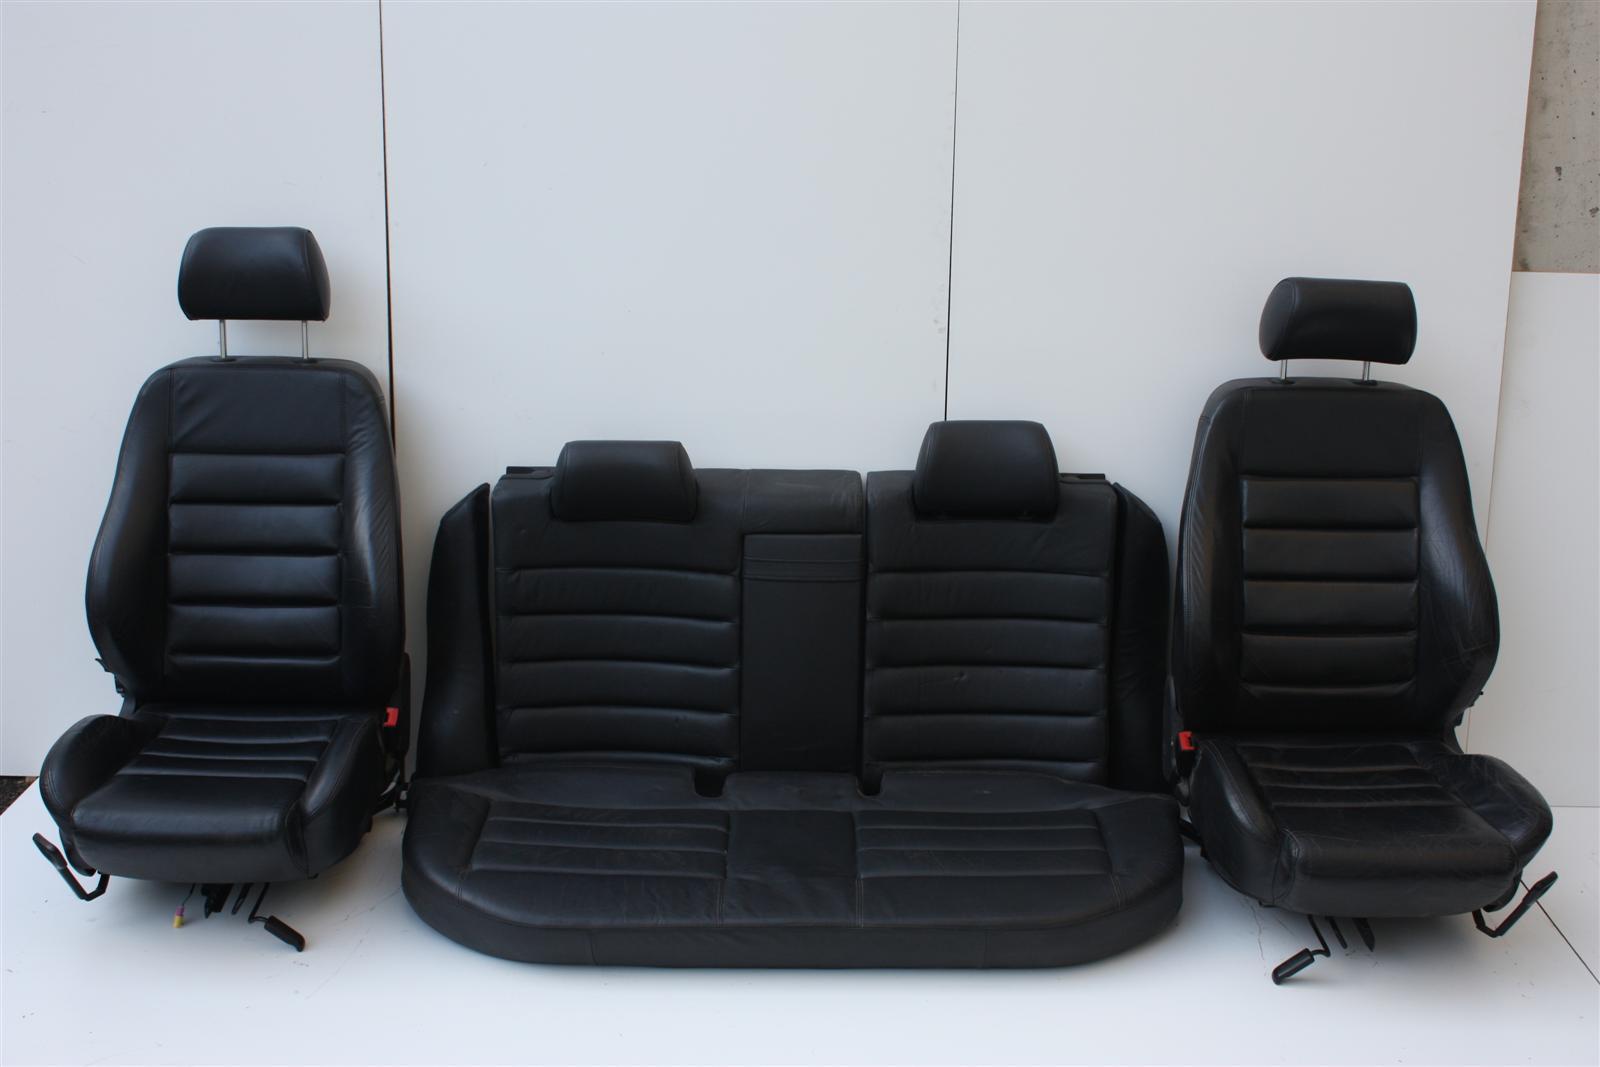 Audi A4 S4 B5 Avant Innenausstattung Leder Schwarz